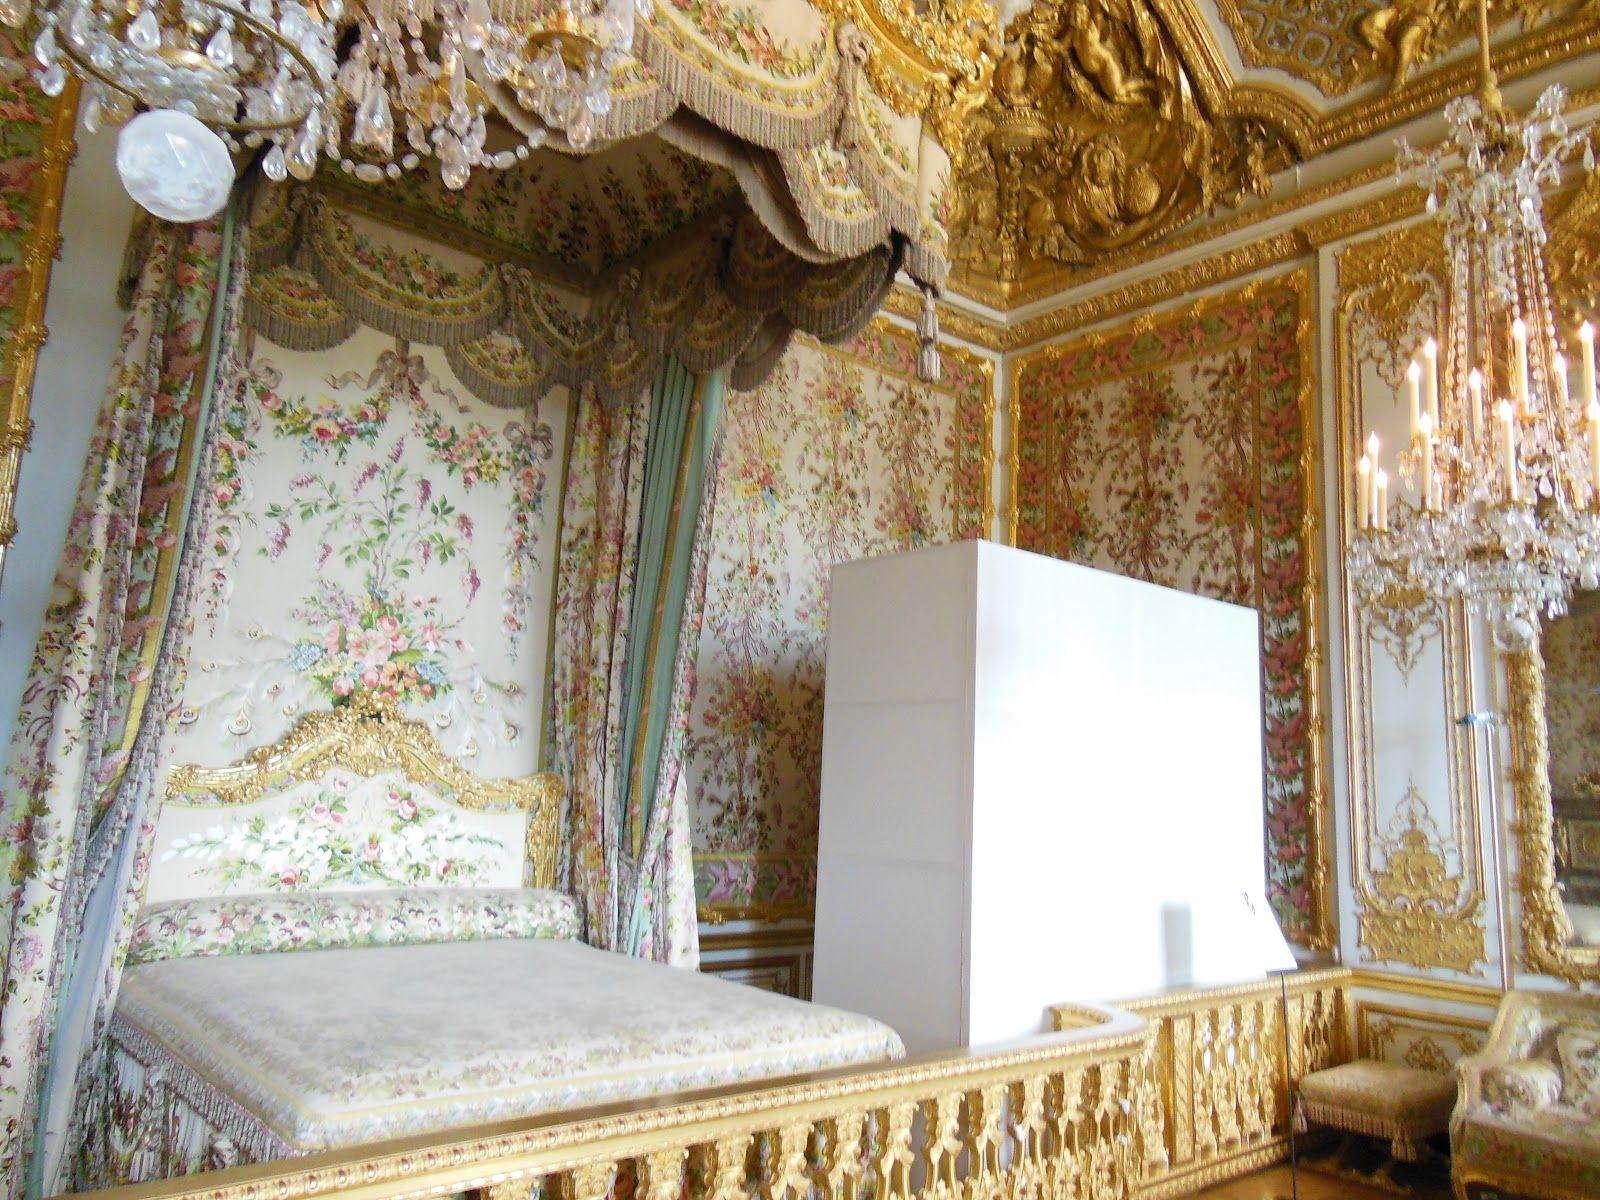 Charmant Inside Buckingham Palace Queens Room | The Queenu0027s Bedroom.